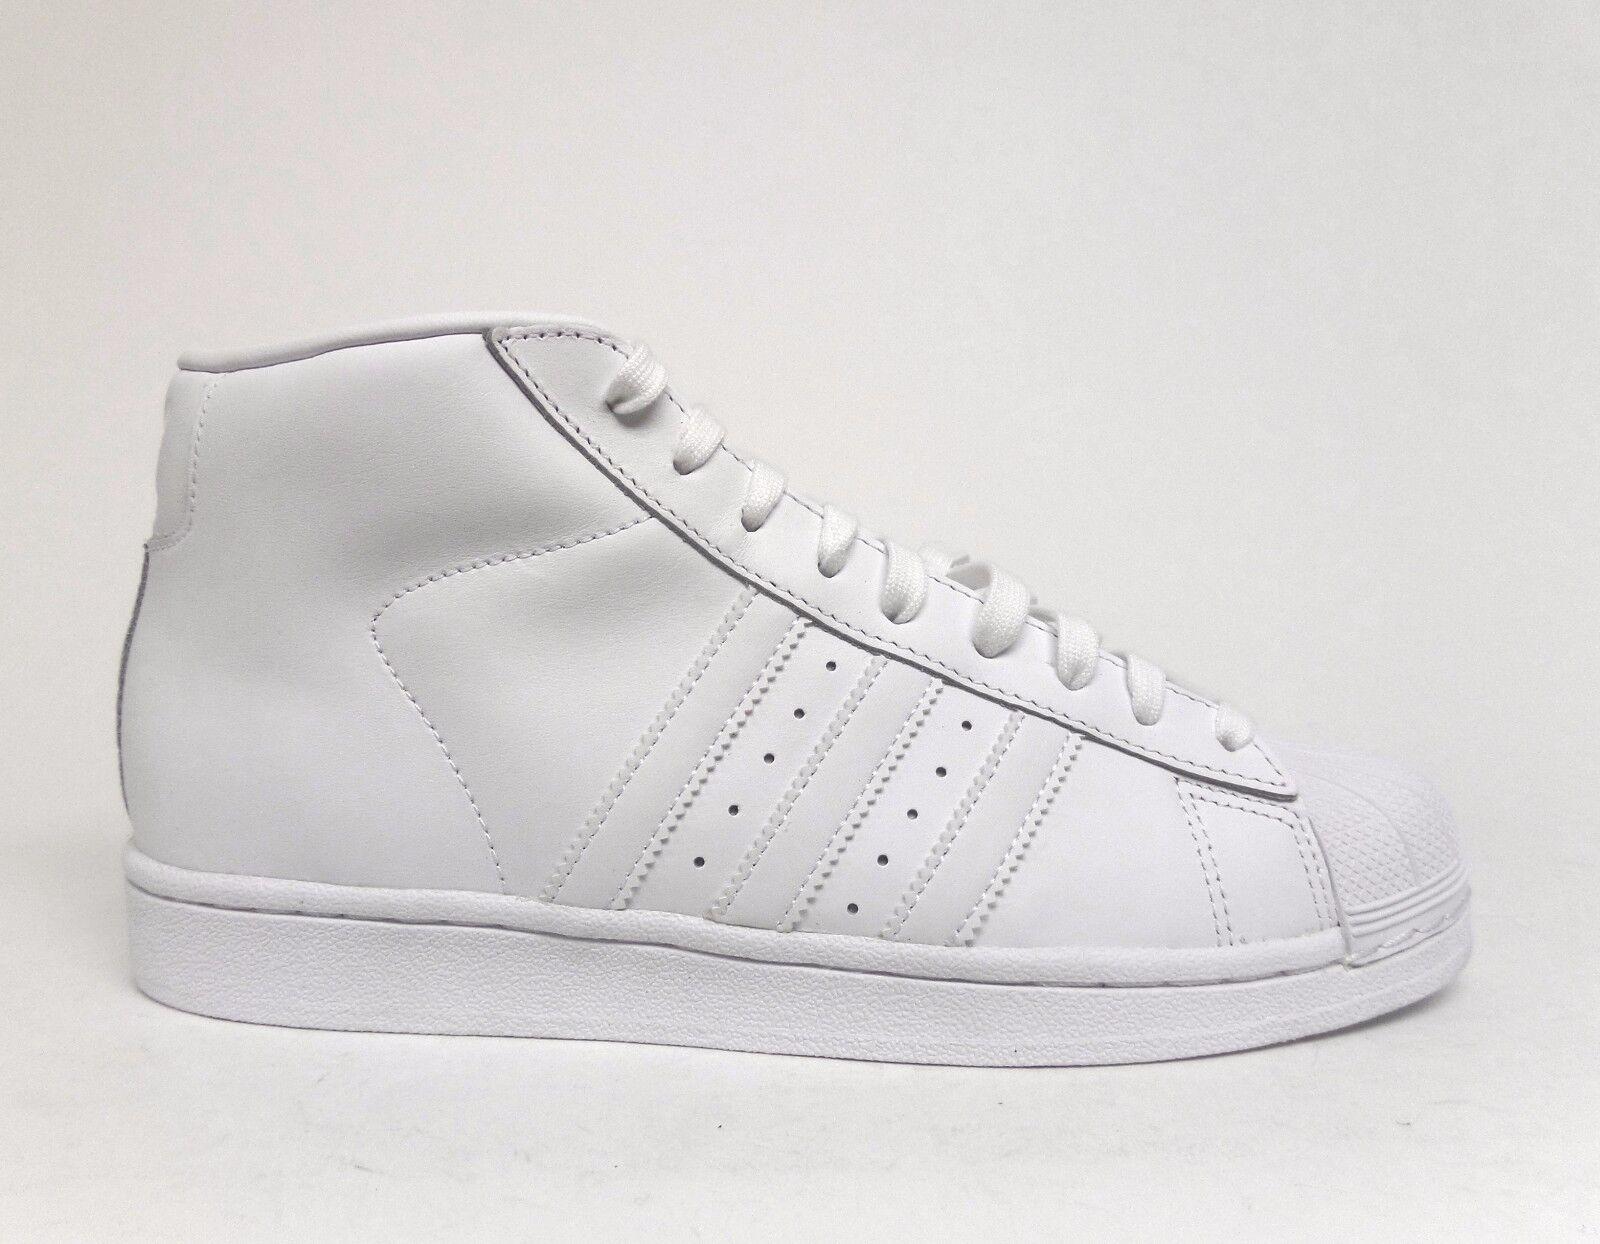 Adidas Men's ORIGINALS PRO MODEL Basketball Shoes White/White AQ5217 a